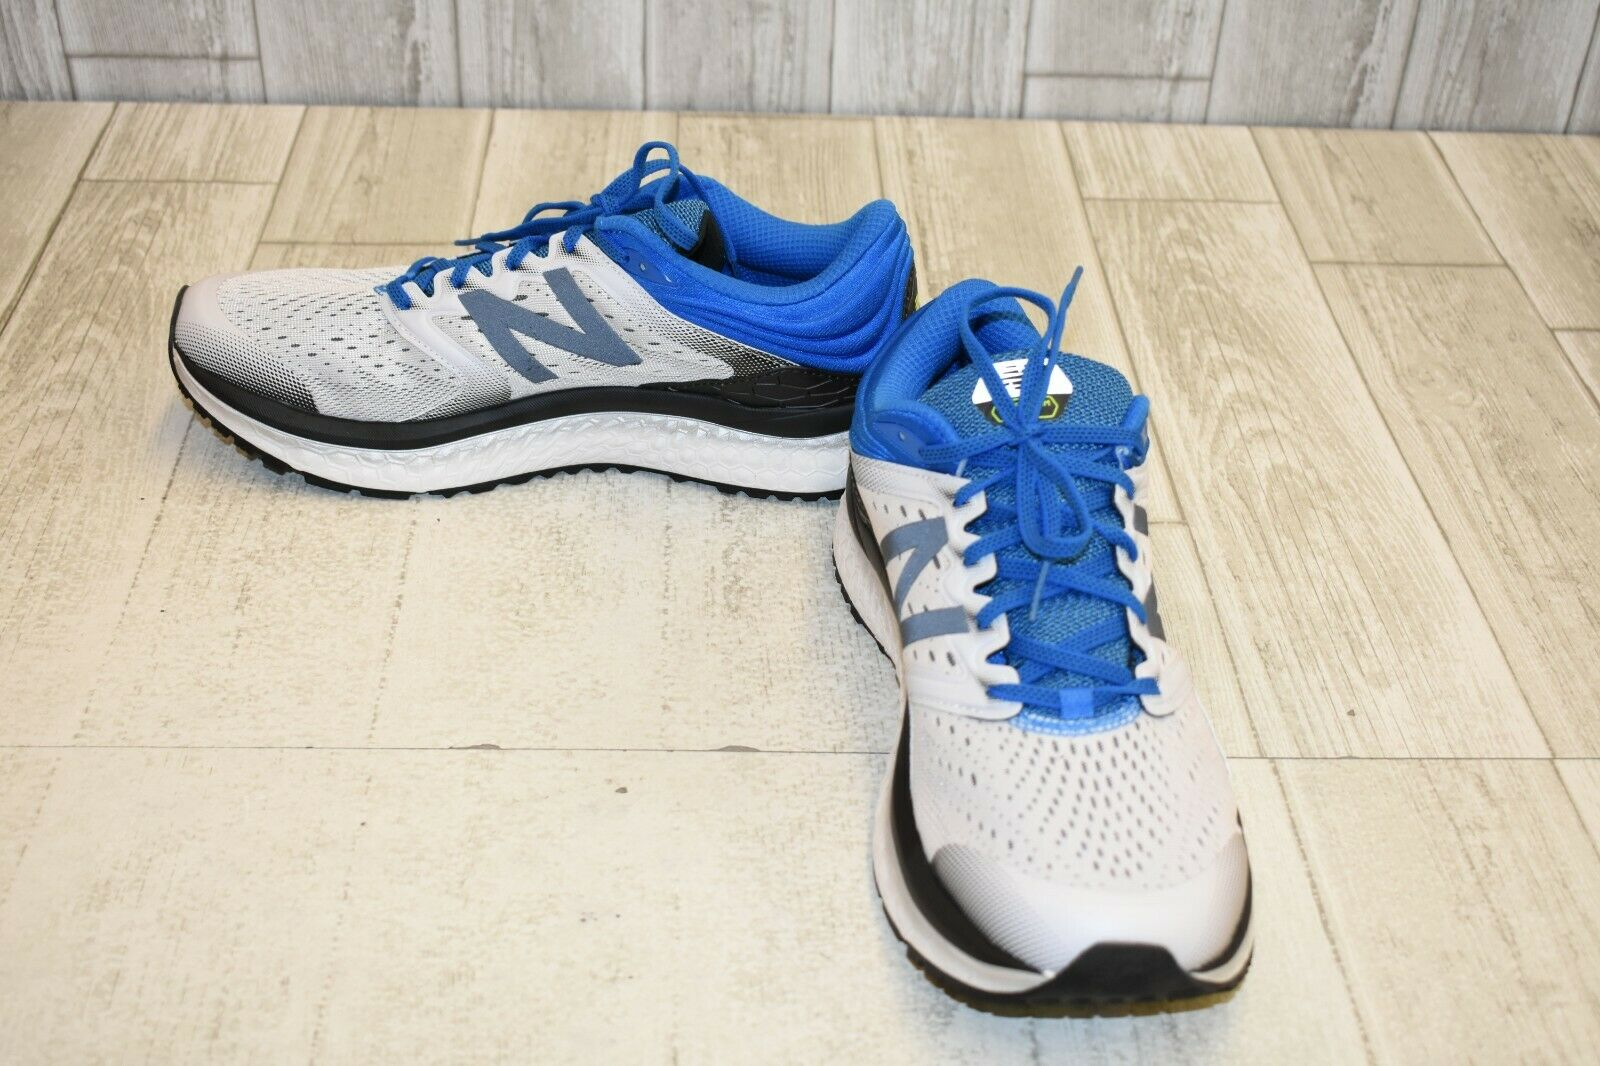 New Balance Fresh Foam 1080v8 Athletic shoes - Men's Size 11.5D, White Black bluee